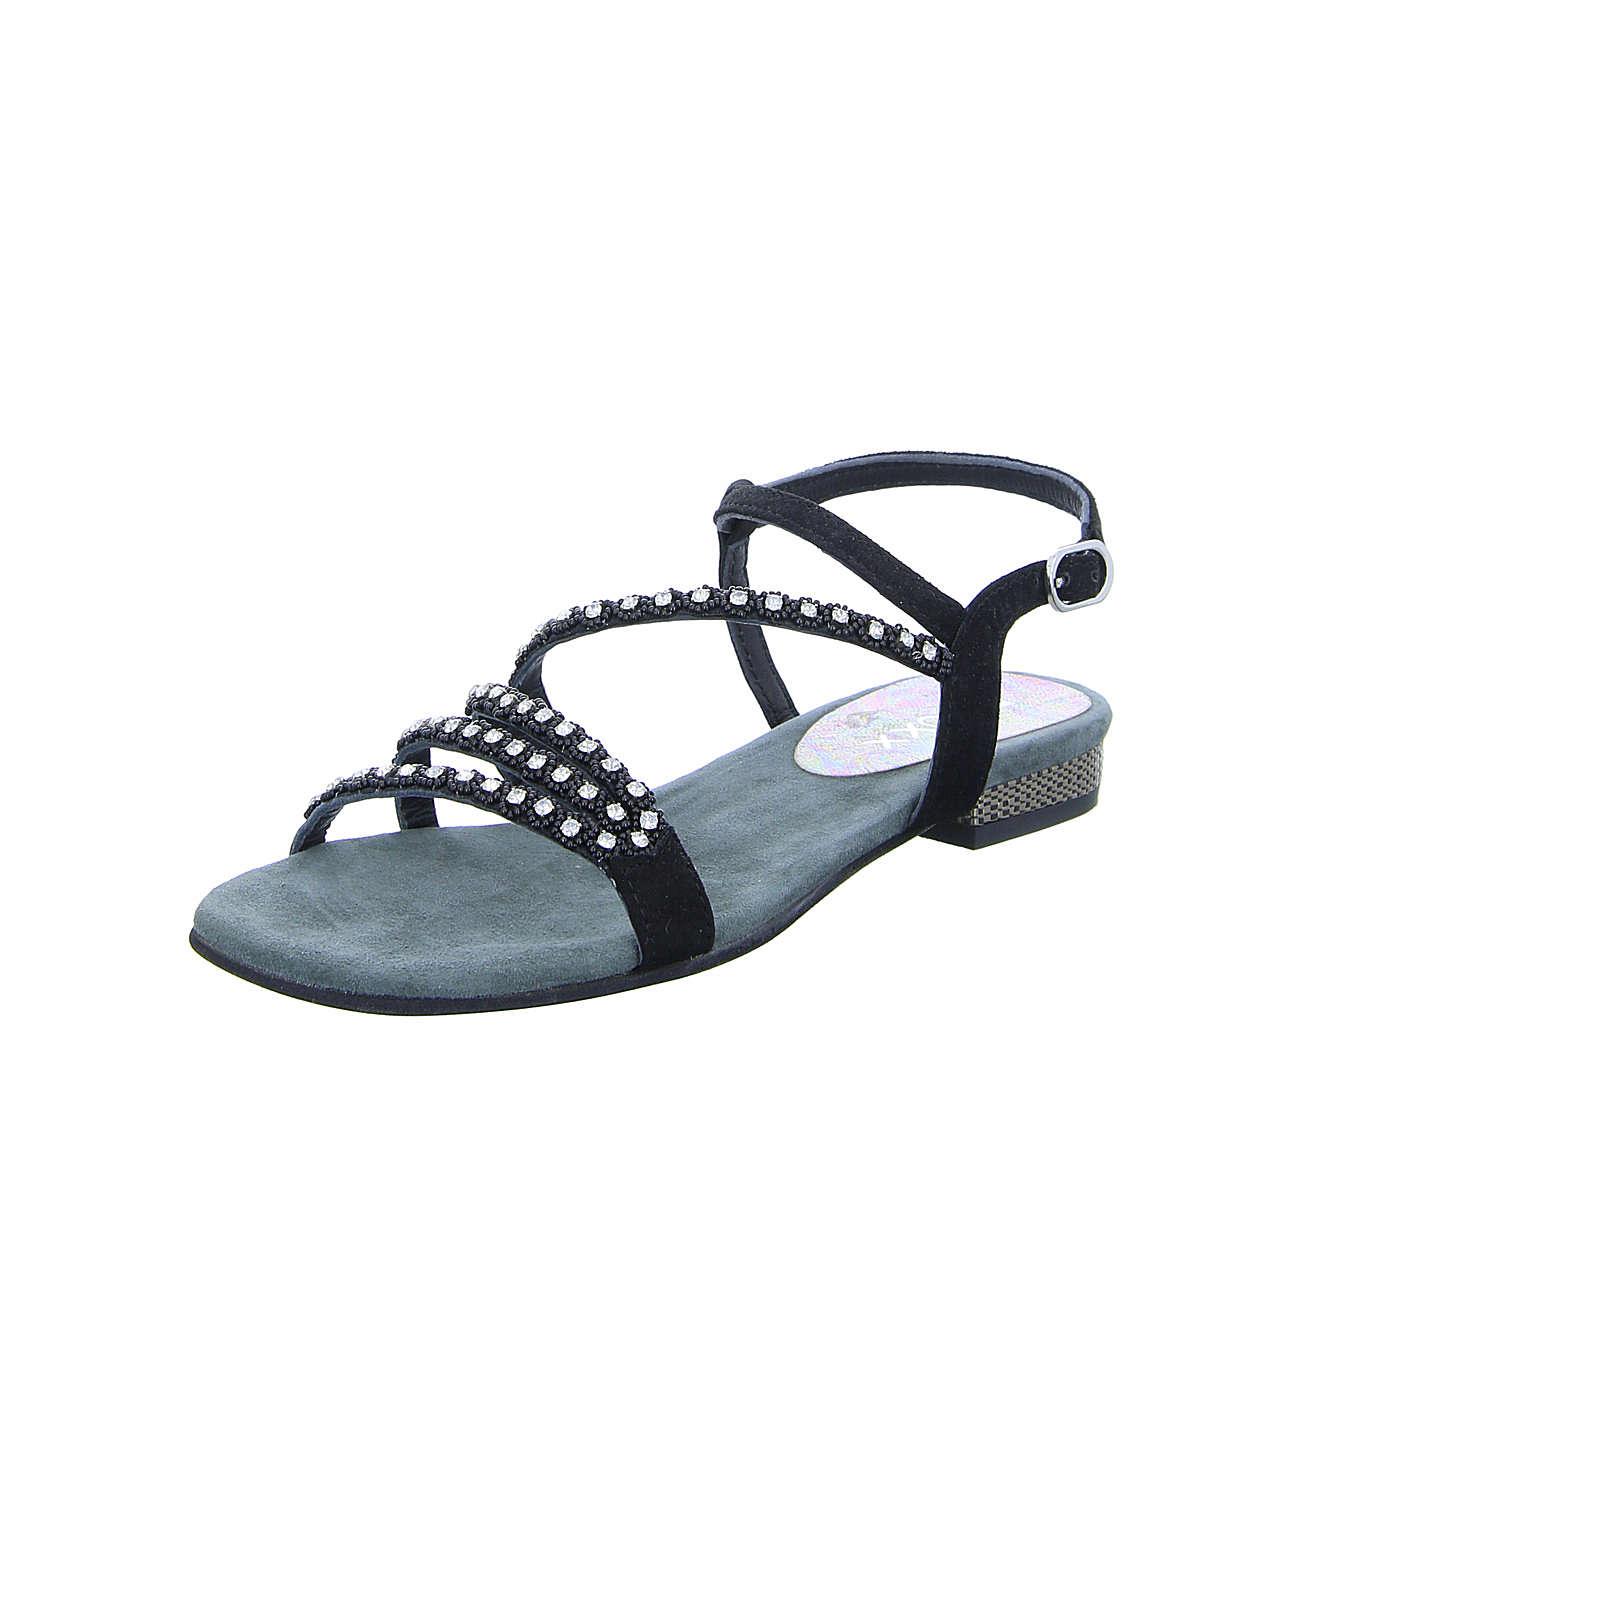 BOXX Damen Sandalette K-12149 schwarz Damen Gr. 40